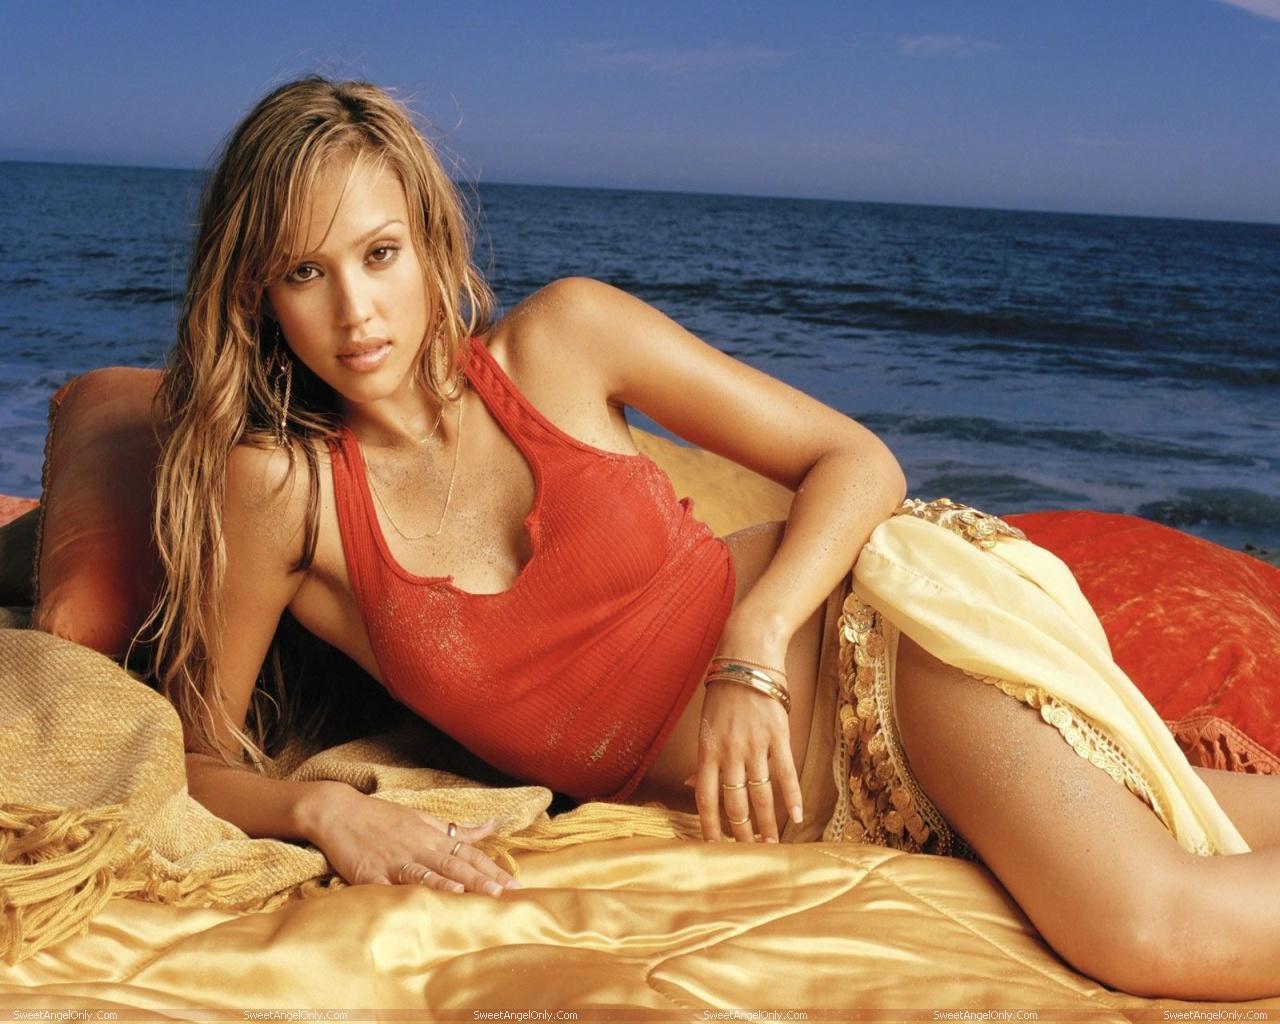 http://1.bp.blogspot.com/-B97l1tPvnRU/TW5abuWCfsI/AAAAAAAAE8g/5ZrHna9hx28/s1600/celebrity_jessica_alba_hot_photo_shoot_in_bikini_sweetangelonly_40.jpg